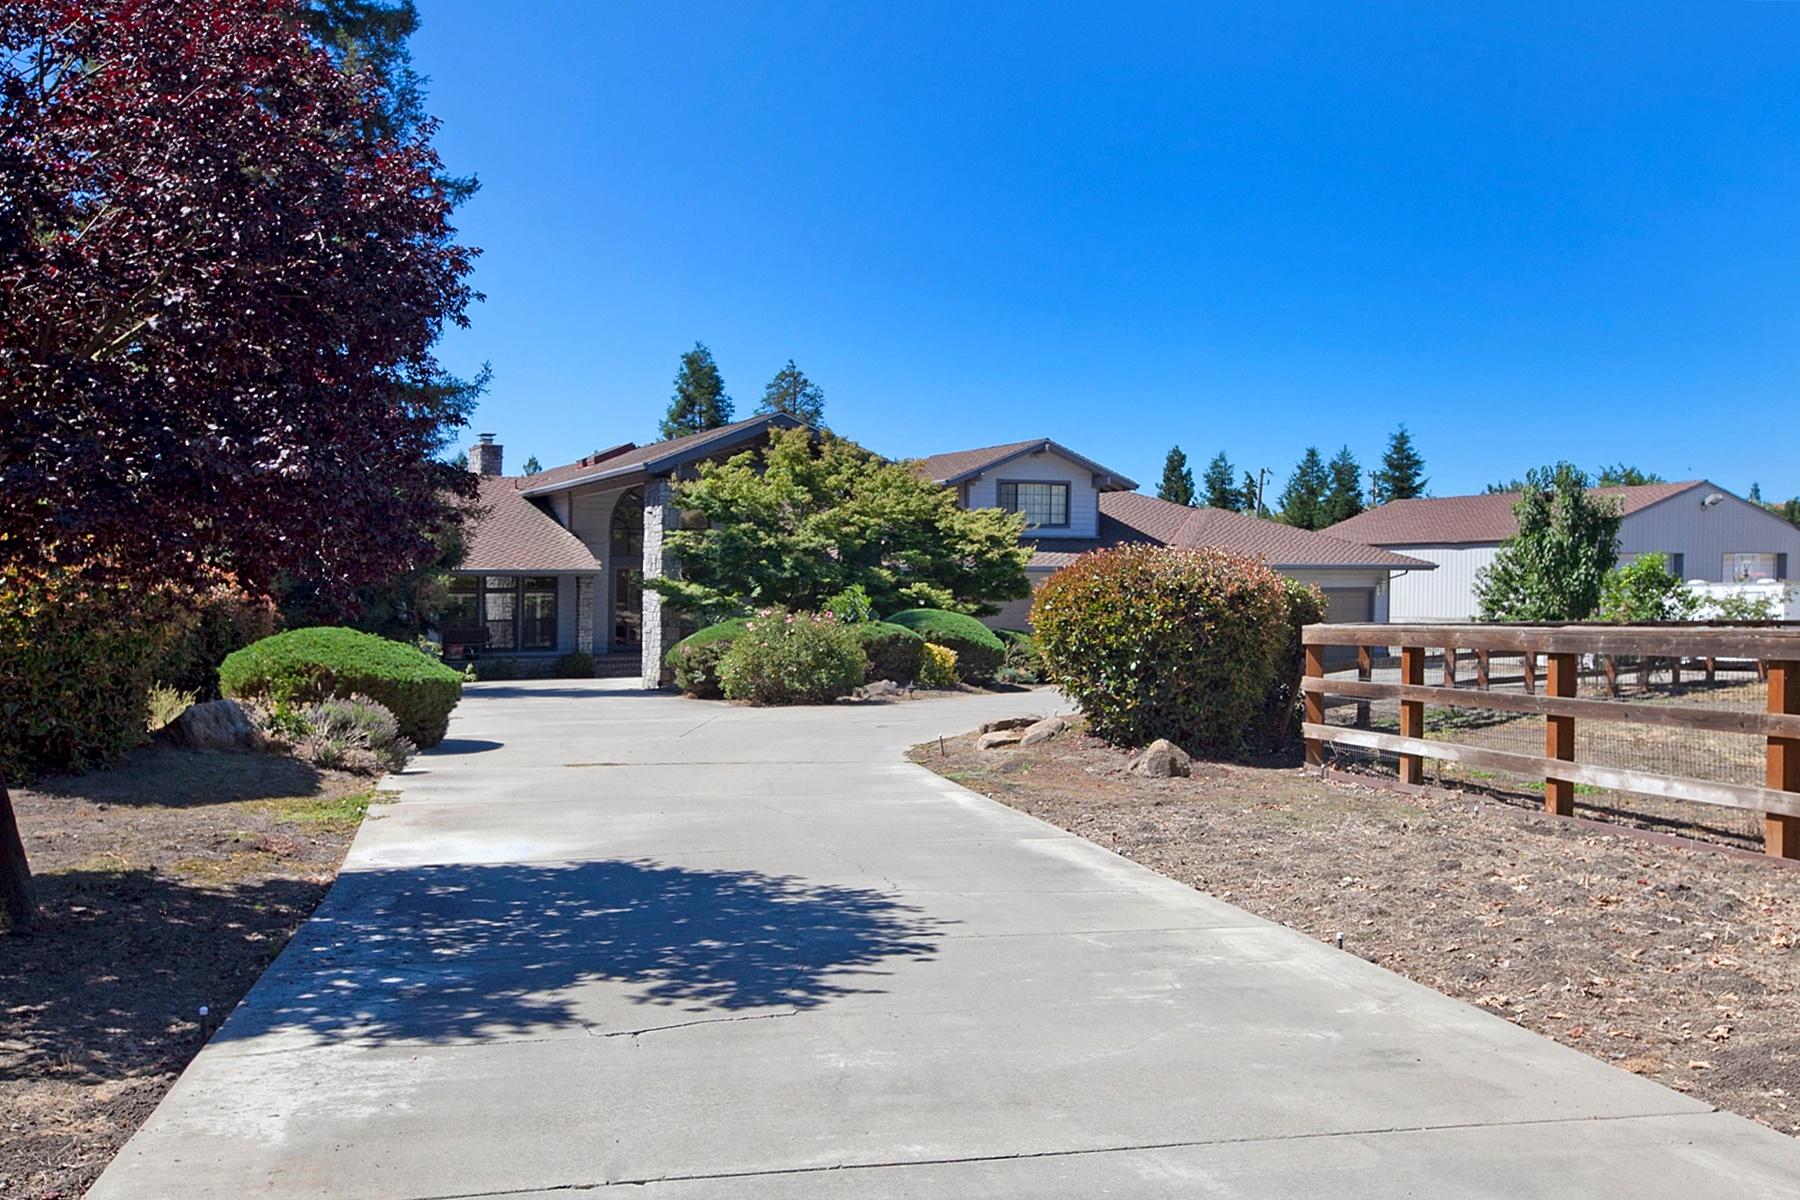 Additional photo for property listing at Exquisite Country Estate 260 Joseph Lane Danville, Californie 94583 États-Unis